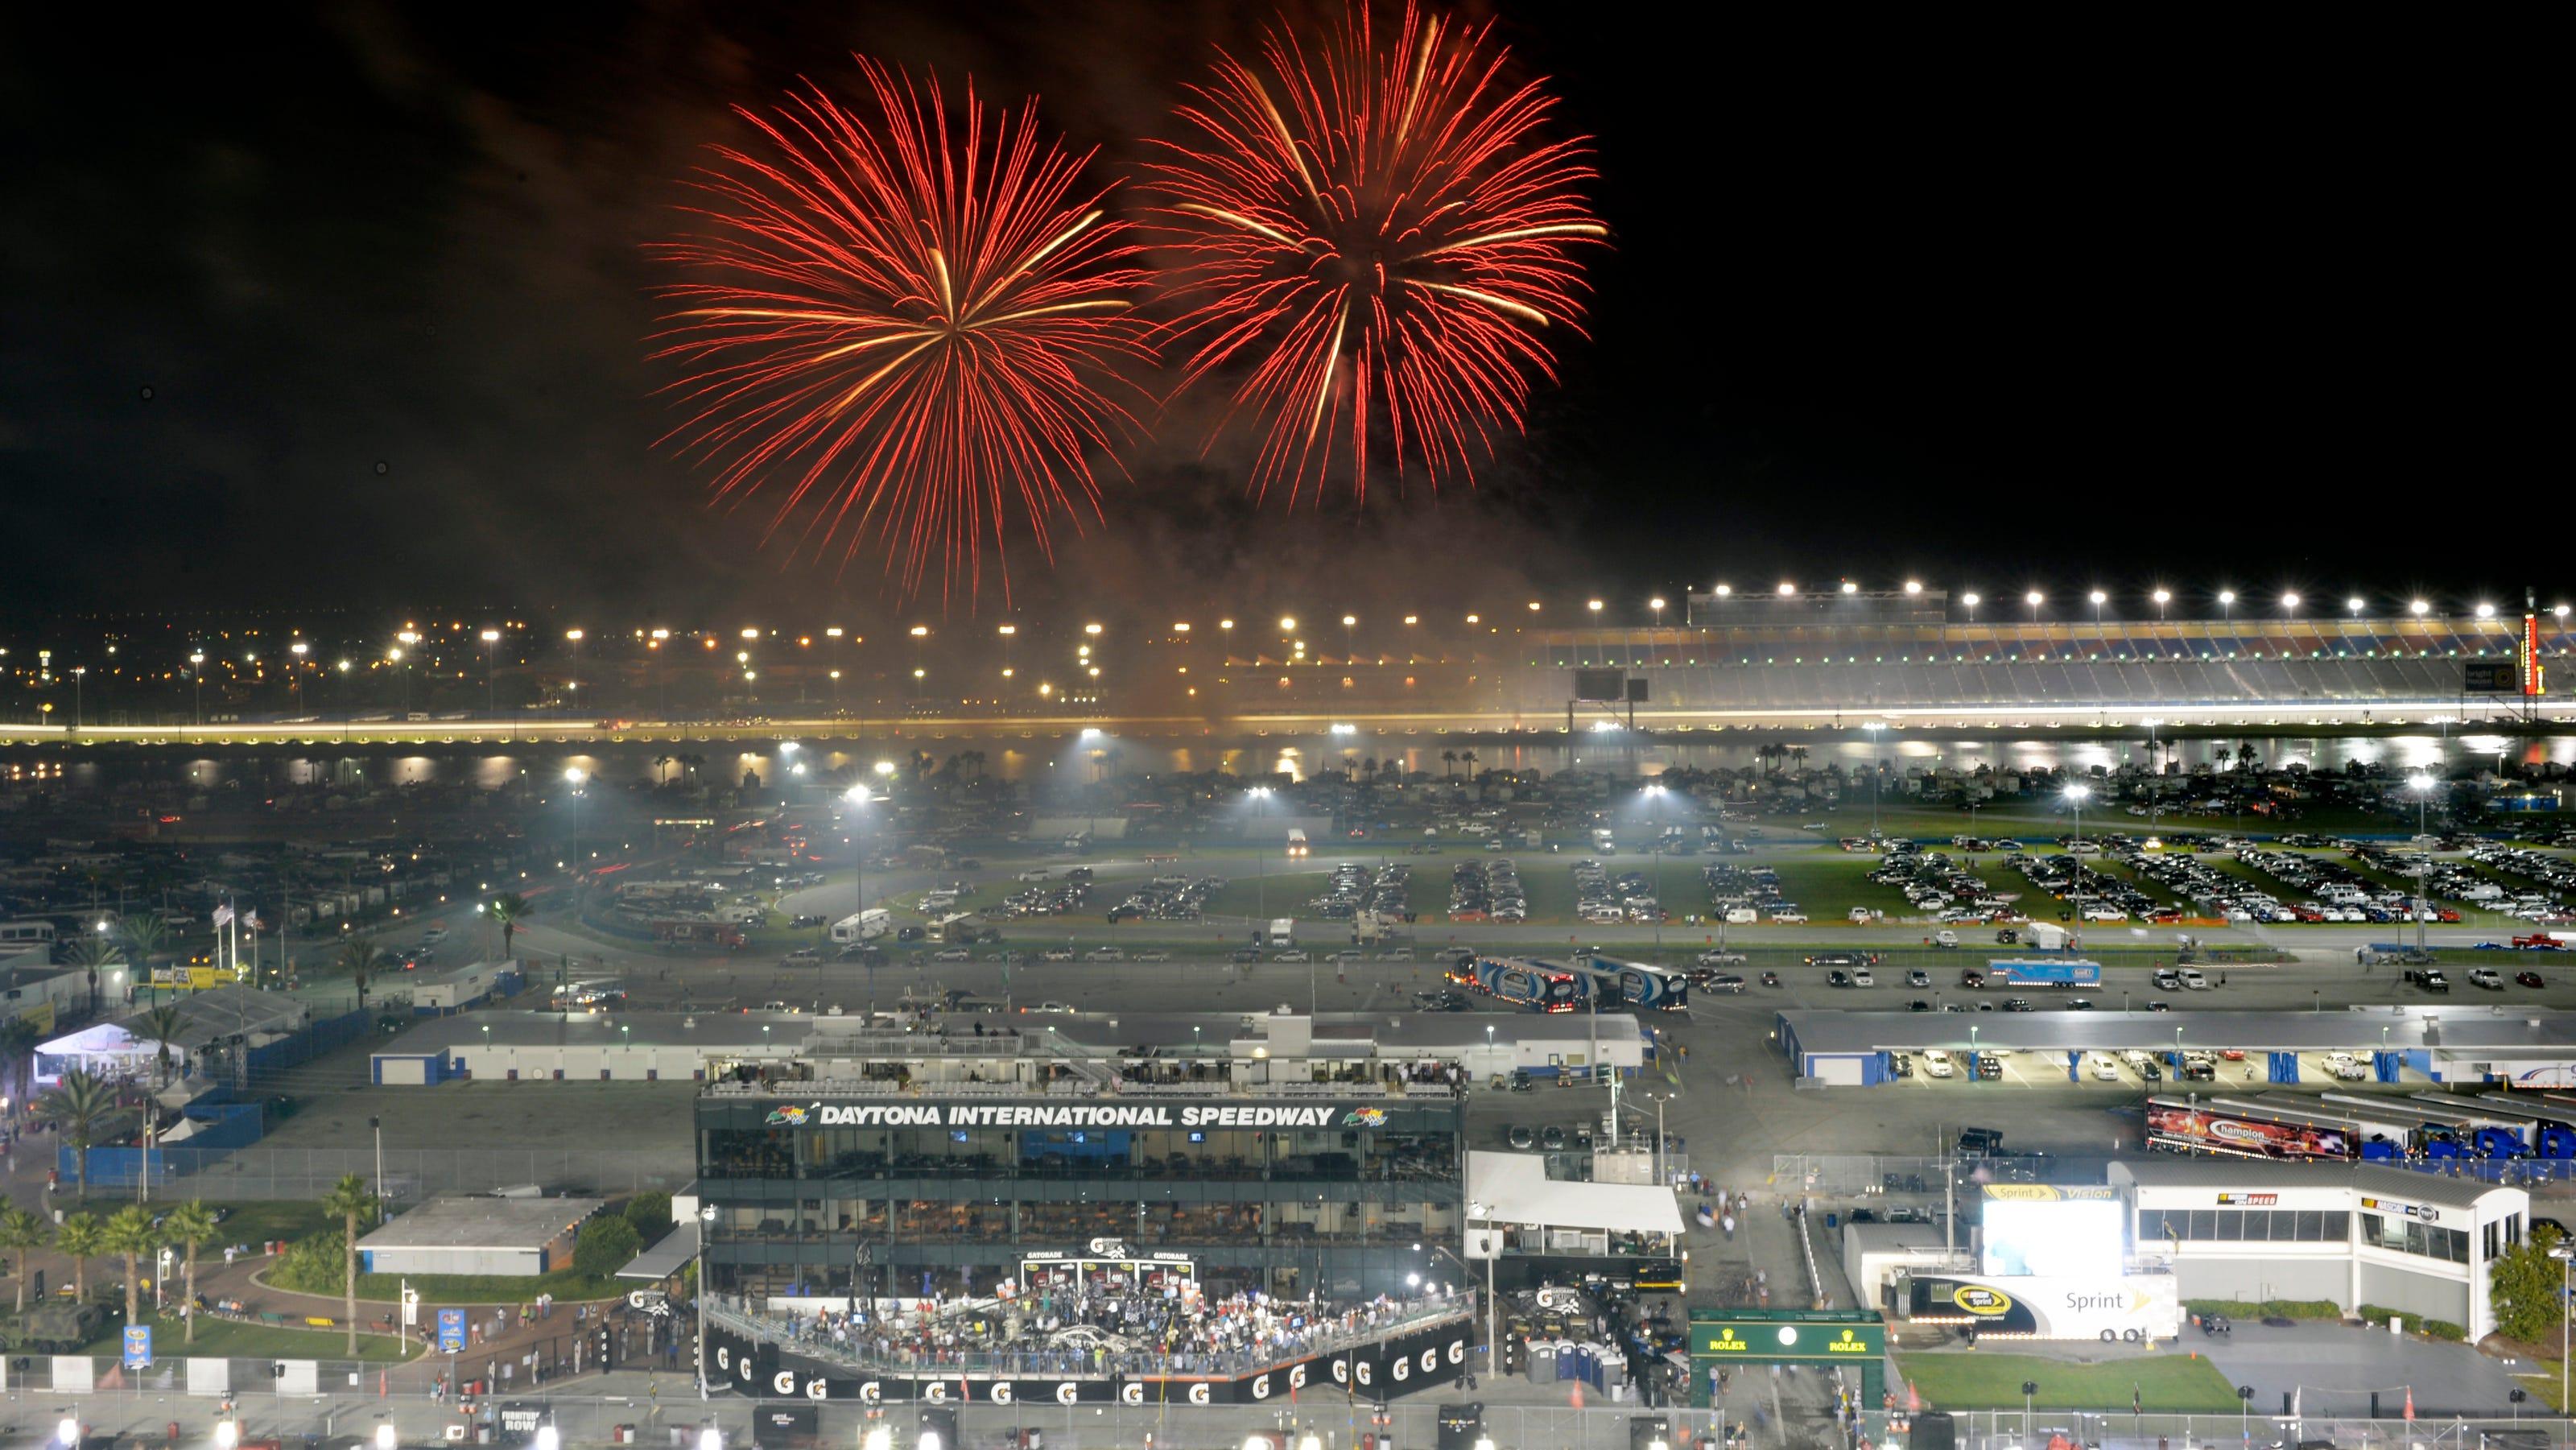 Nascar Will See End Of July 4th Era At Daytona After Saturday S Race